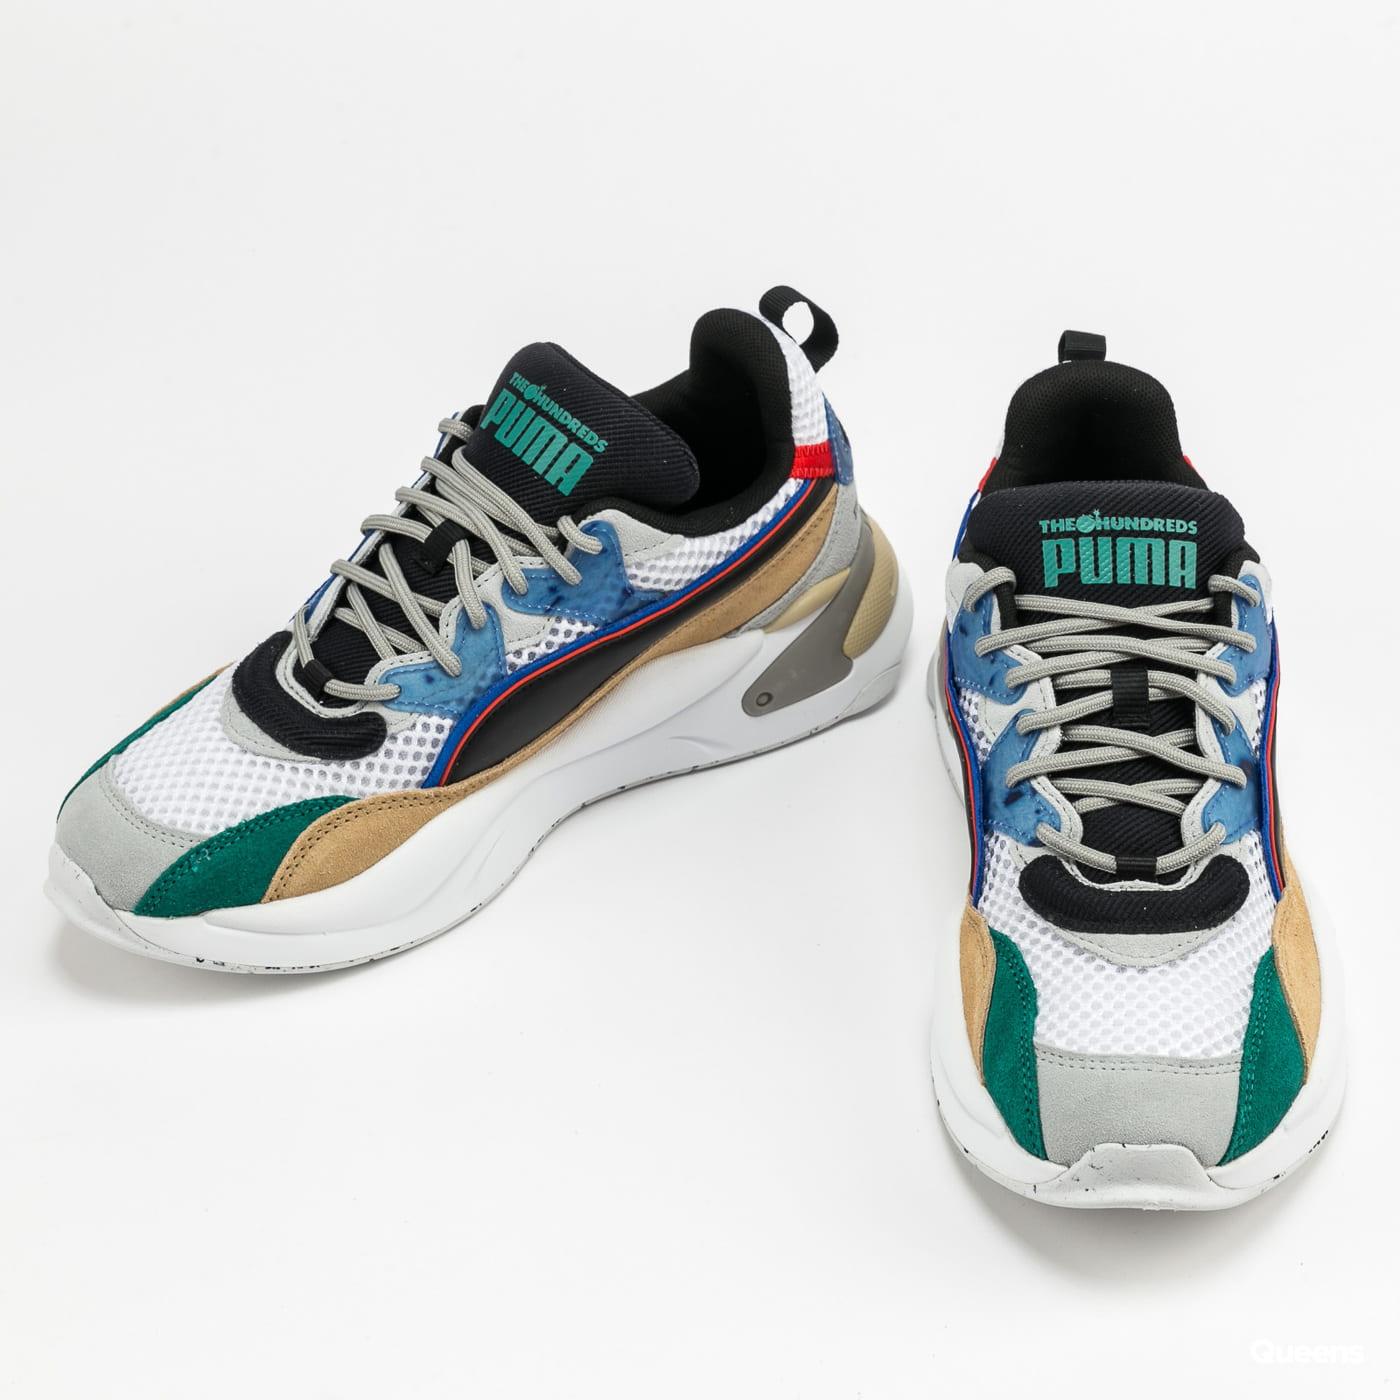 Sneakers Puma Rs 2k Hf The Hundreds 373724 01 Queens